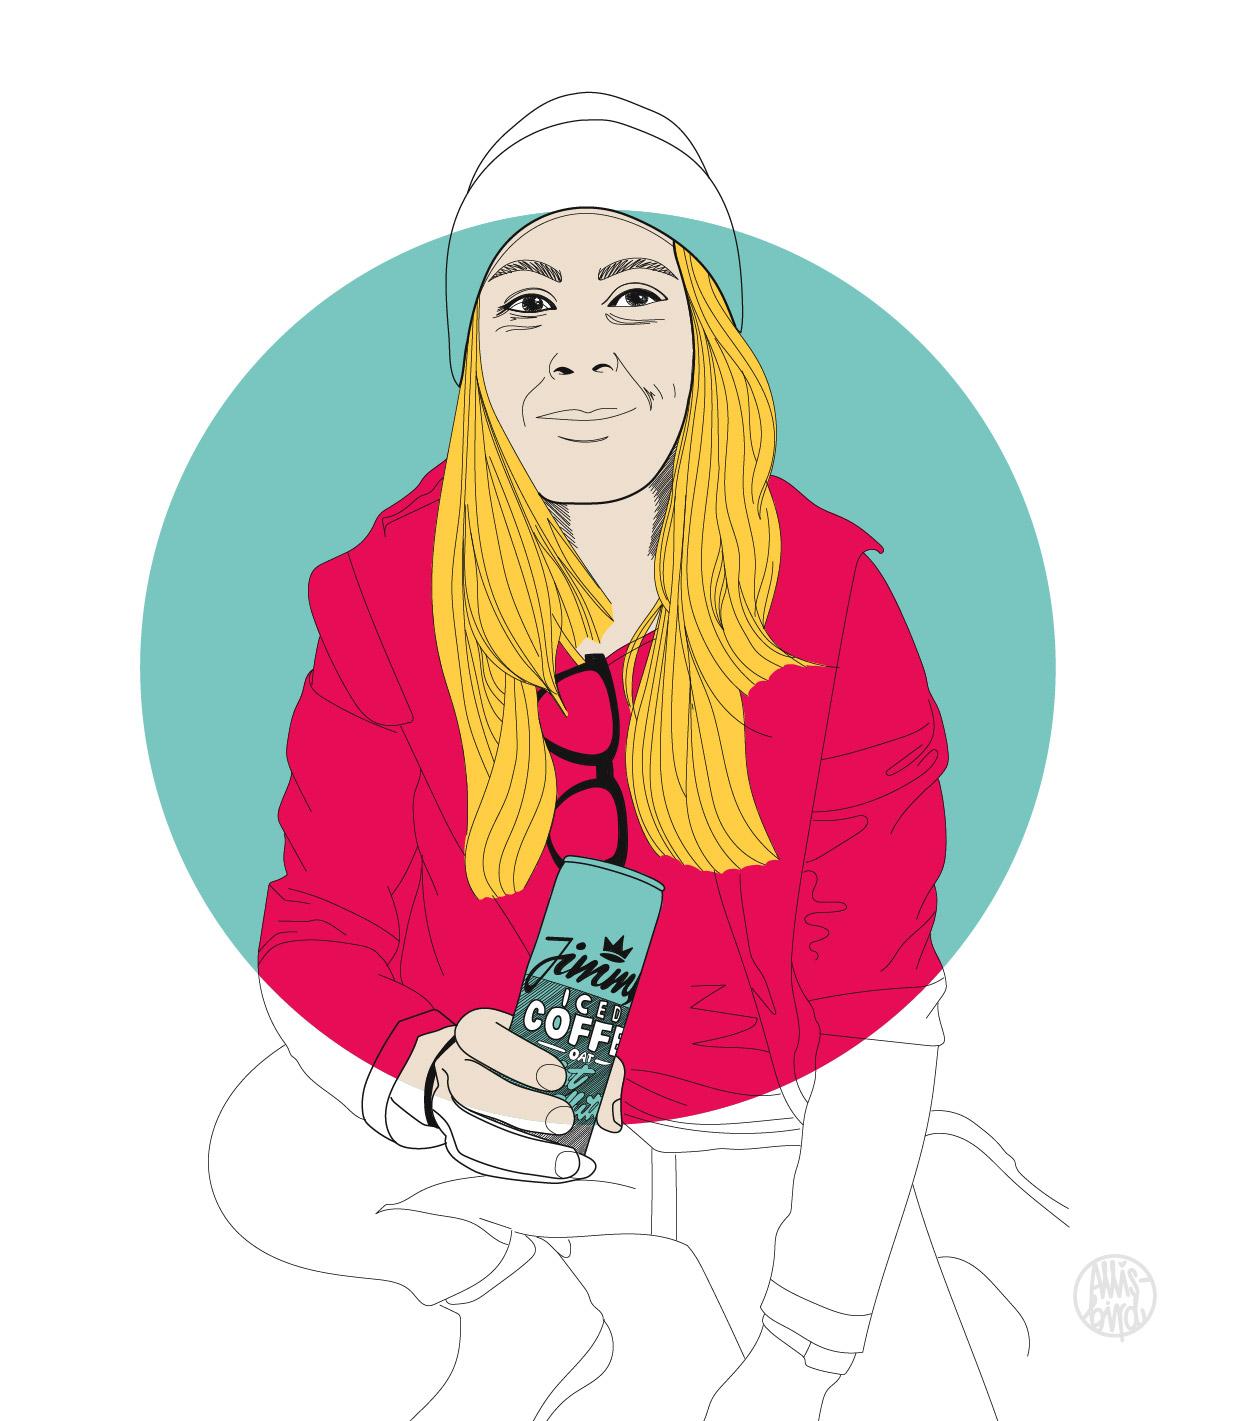 portrait-illustration-grafikdesign-juliet-elliot